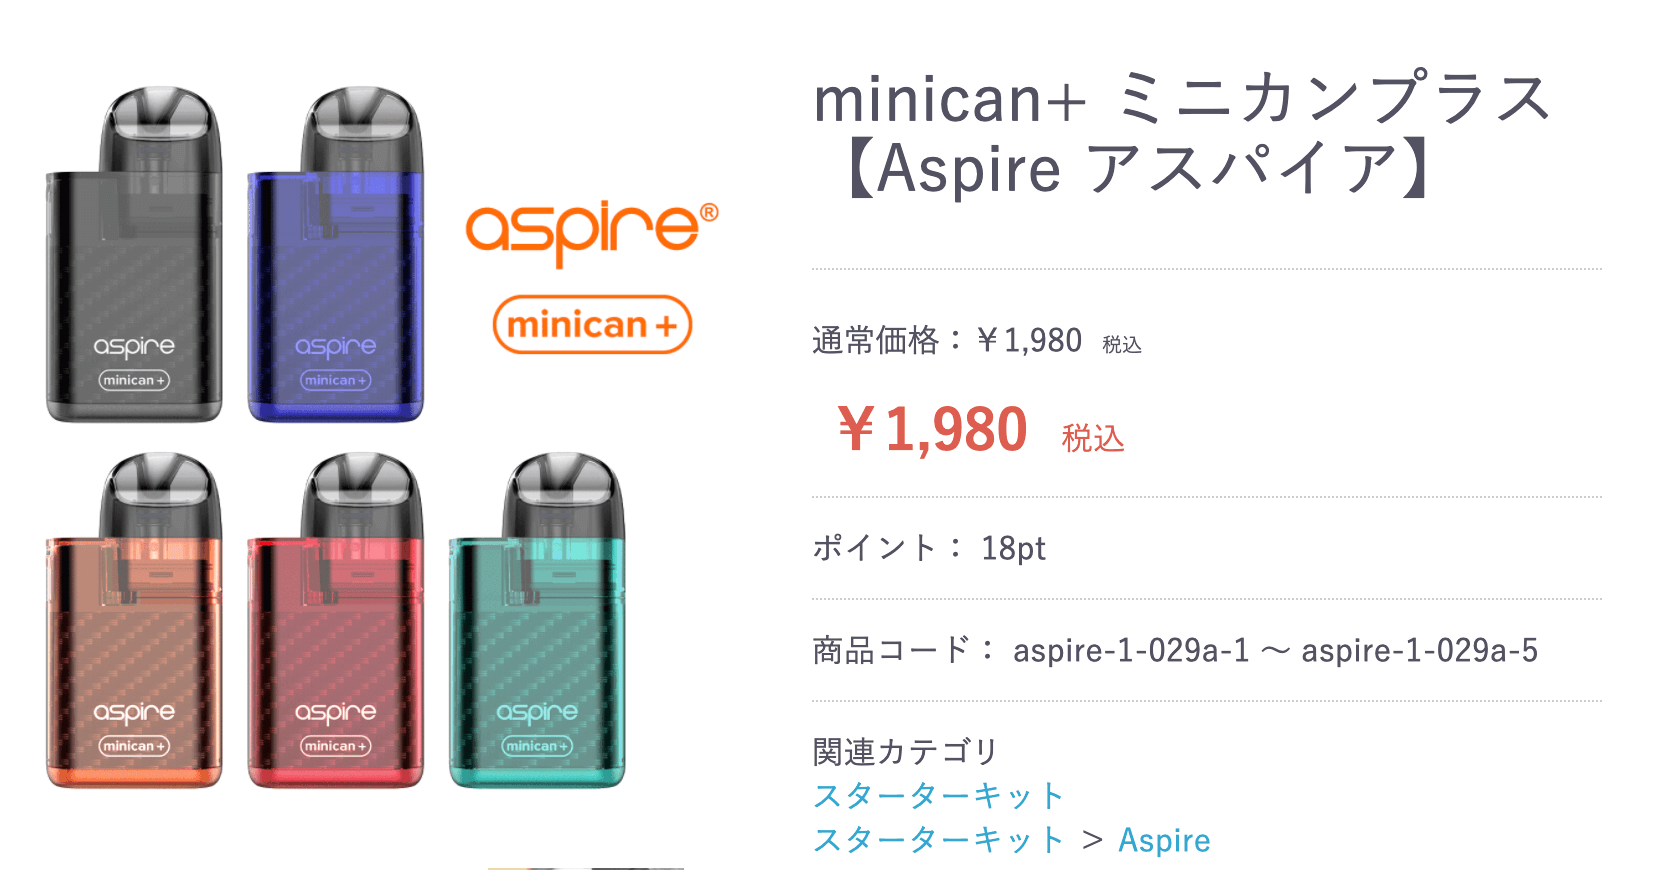 Minicanプラスの販売ページ